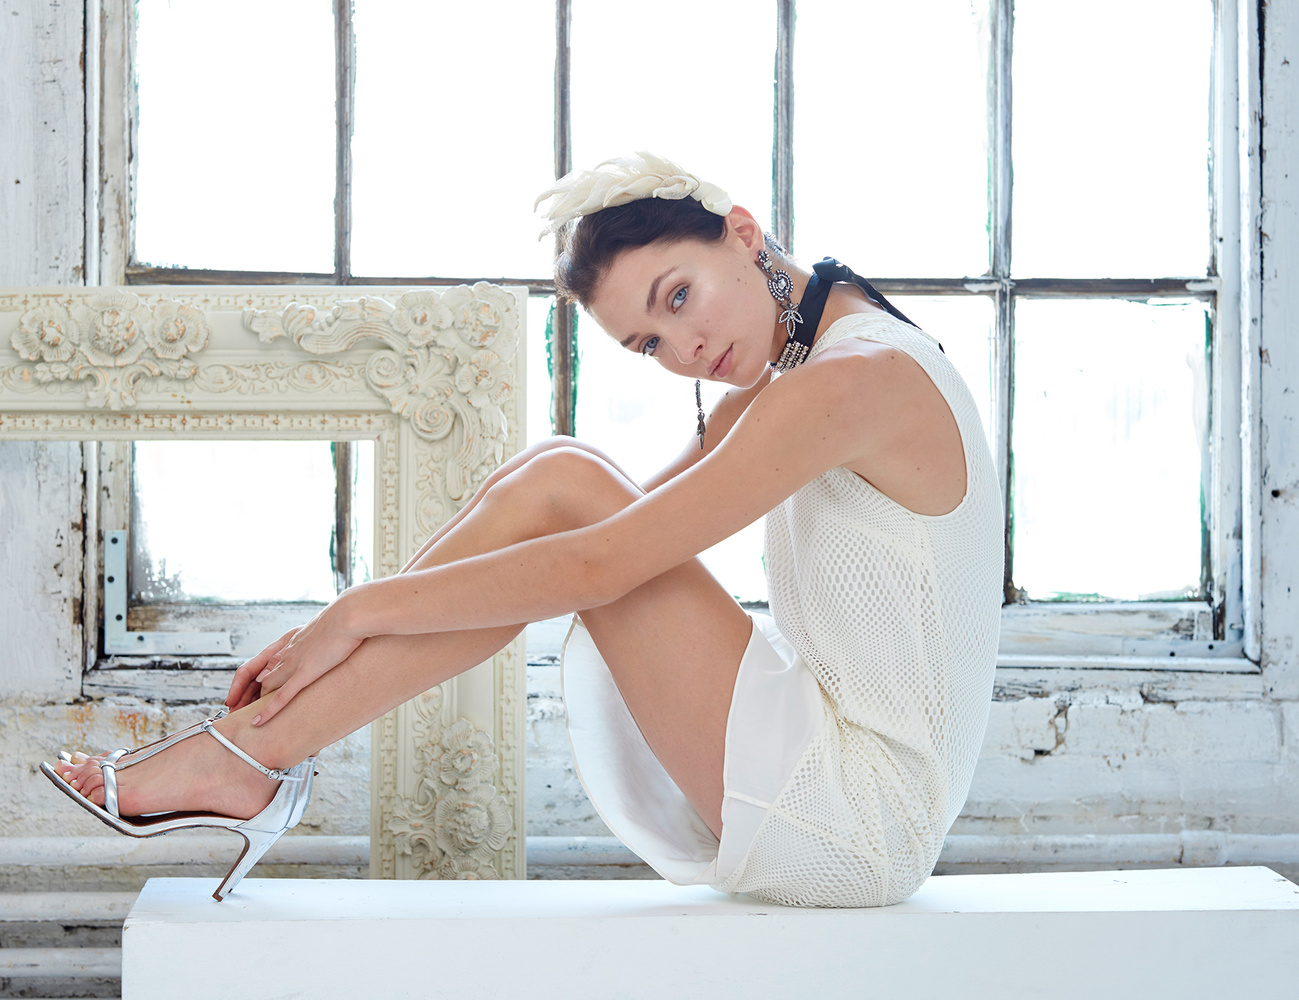 White Fashion Shoot Window by Dan Howell